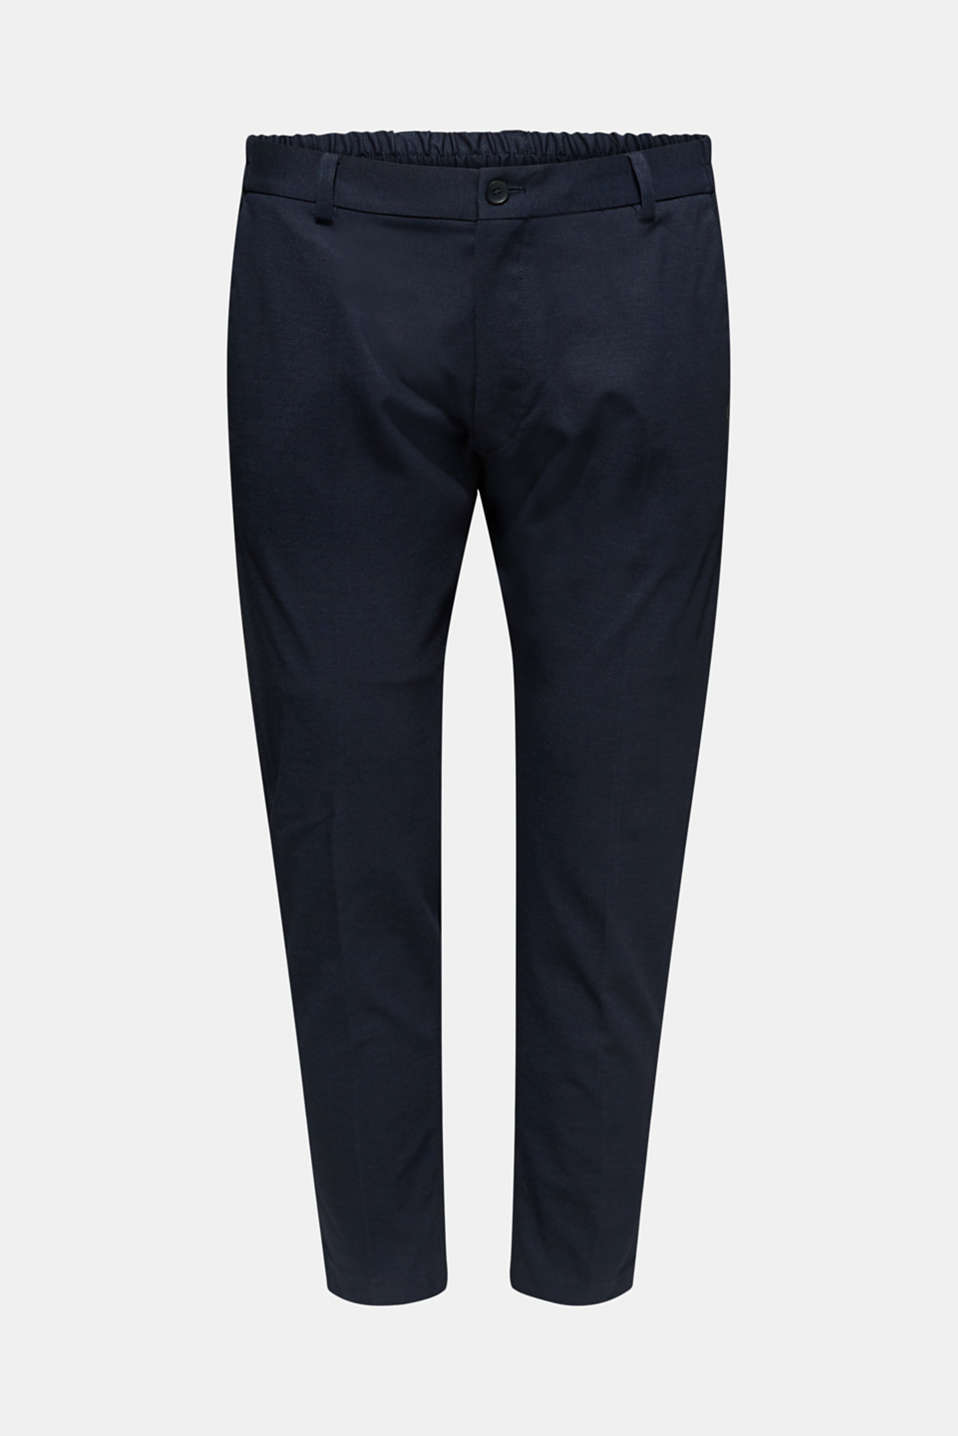 Pants suit, NAVY, detail image number 6